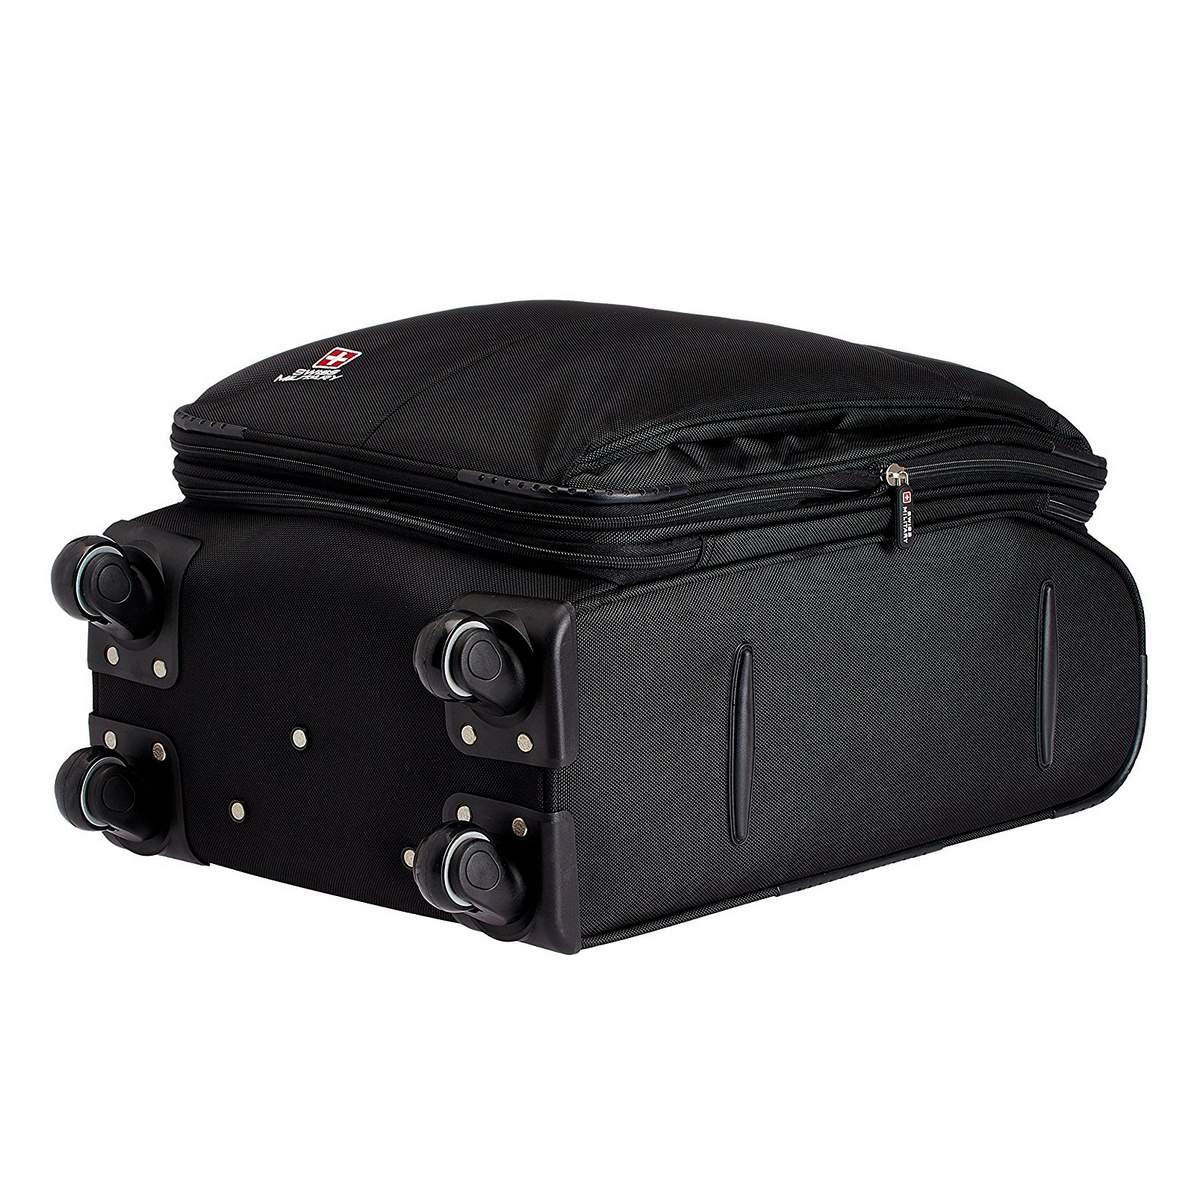 1e59f08bb0be Swiss Military TL5 20 inch Softsided Travel Luggage Bag-Sunrise ...